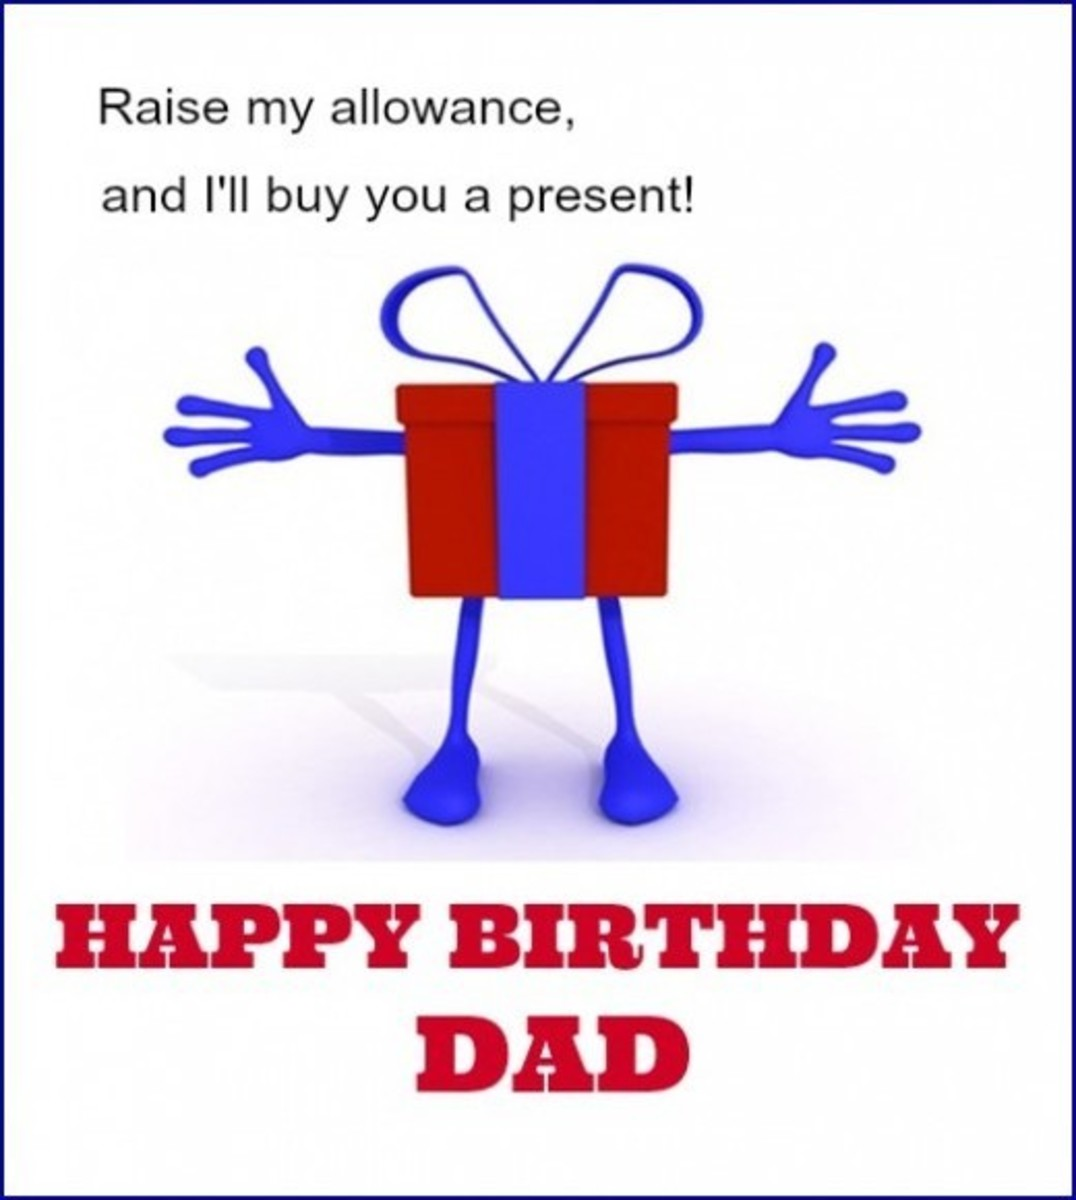 Inside Funny Dad Birthday Card from Kid